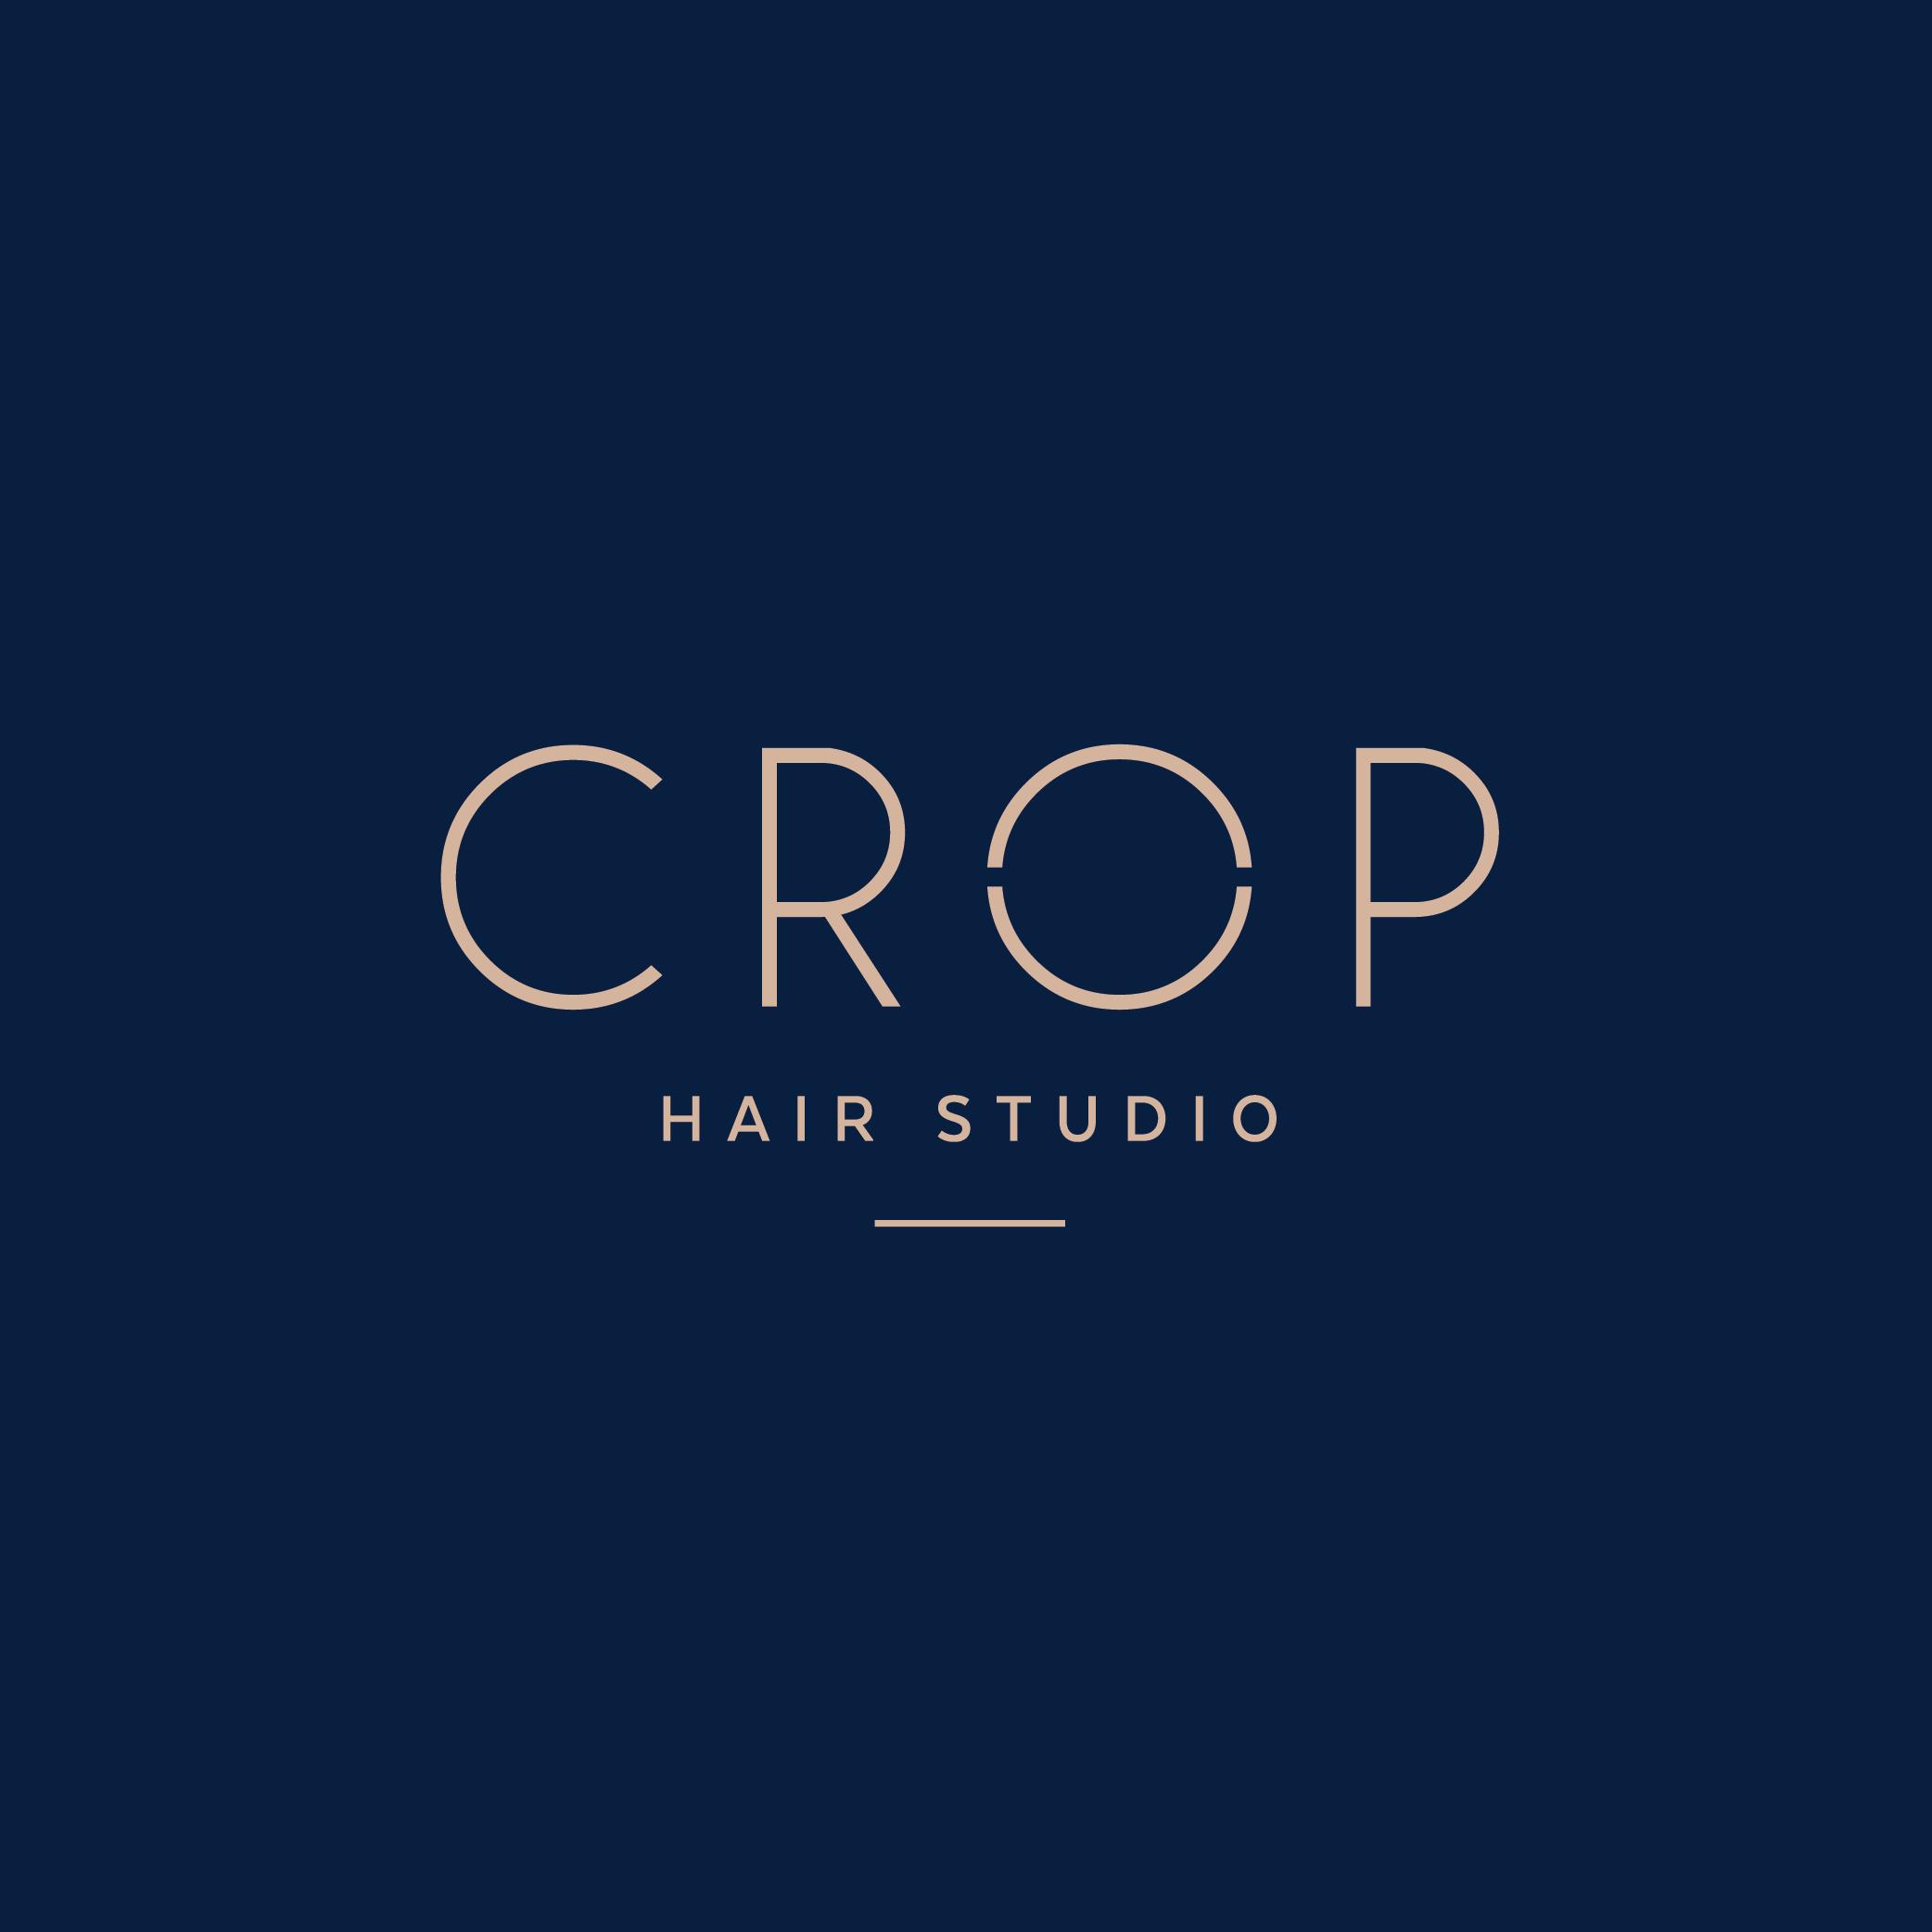 Crop Hair Studio